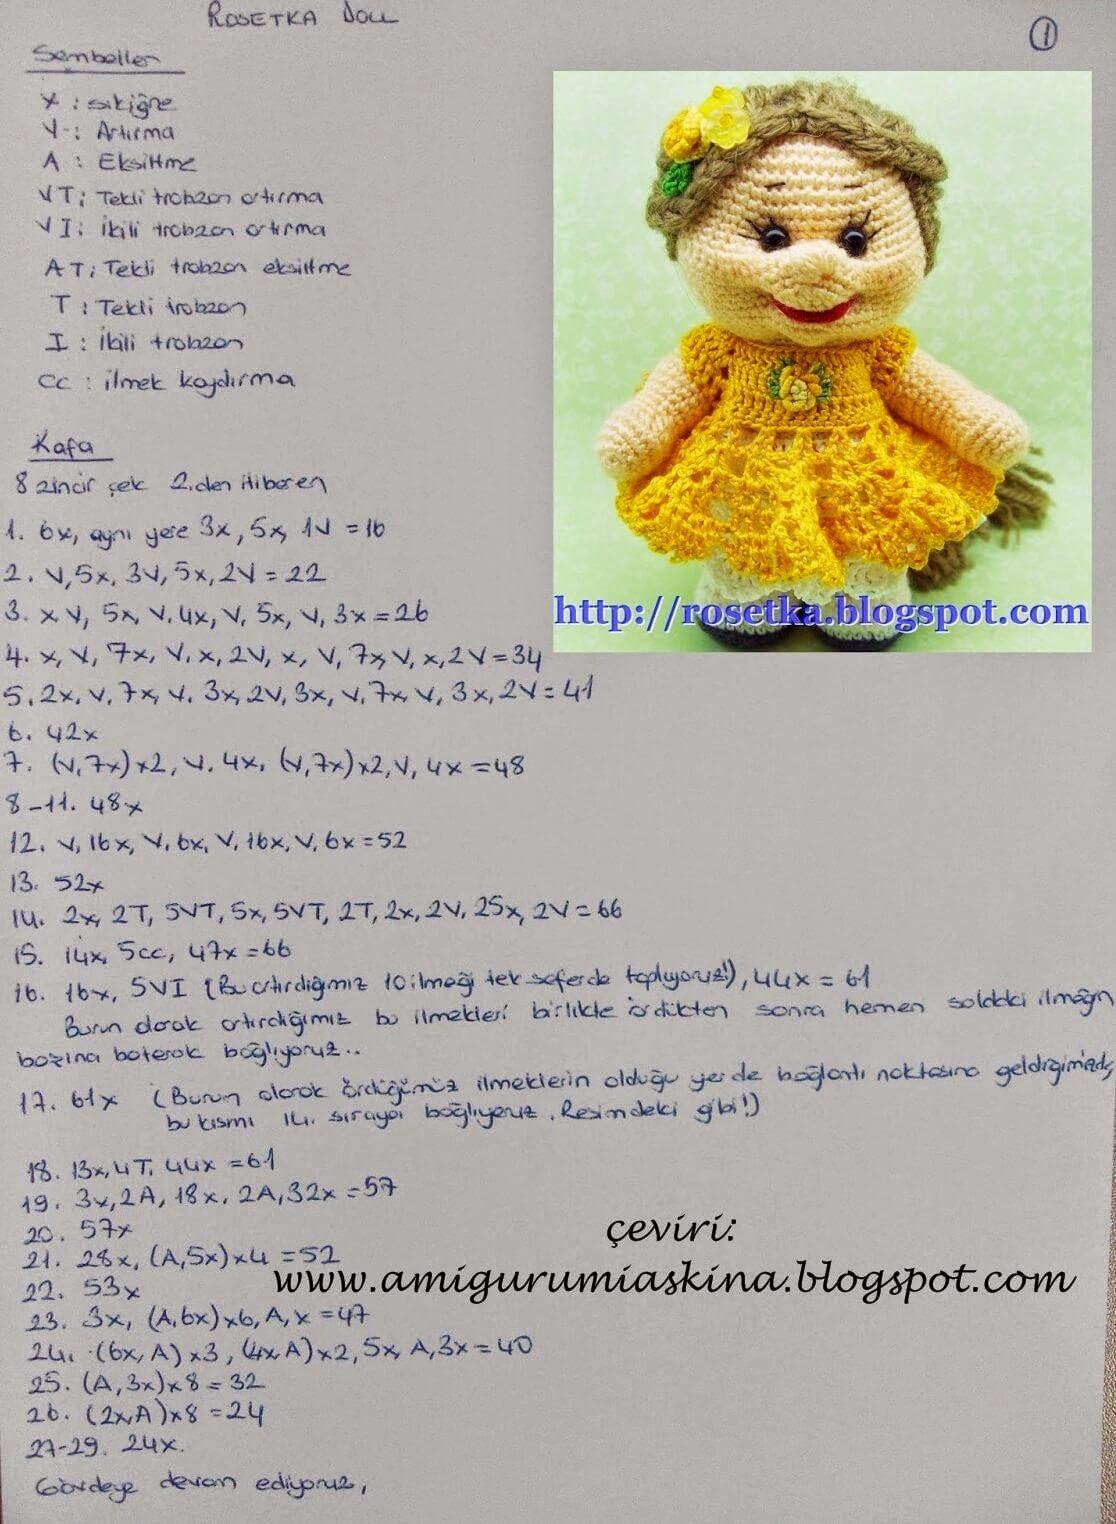 Amigurumi Askina Doll Pattern : Amigurumi A?k?na: Amigurumi Bebek Yap?l???- Amigurumi Free ...